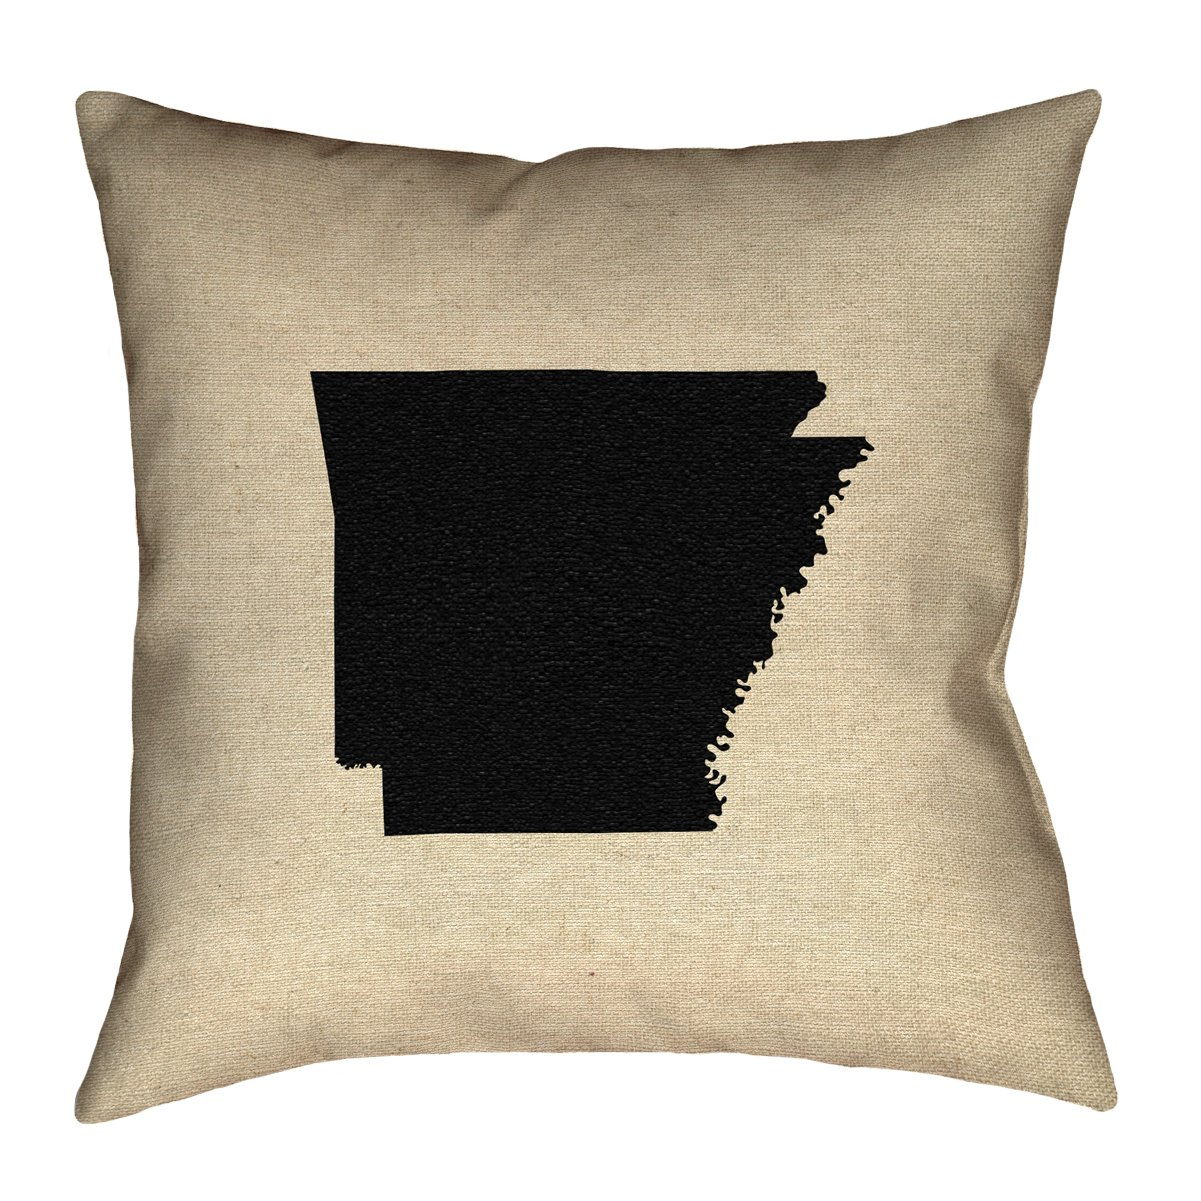 ArtVerse SMI165F3636L Katelyn Smith Arkansas 36 X 36 Floor Pillows Double Sided Print with Concealed Zipper /& Insert Arkansas Pillow